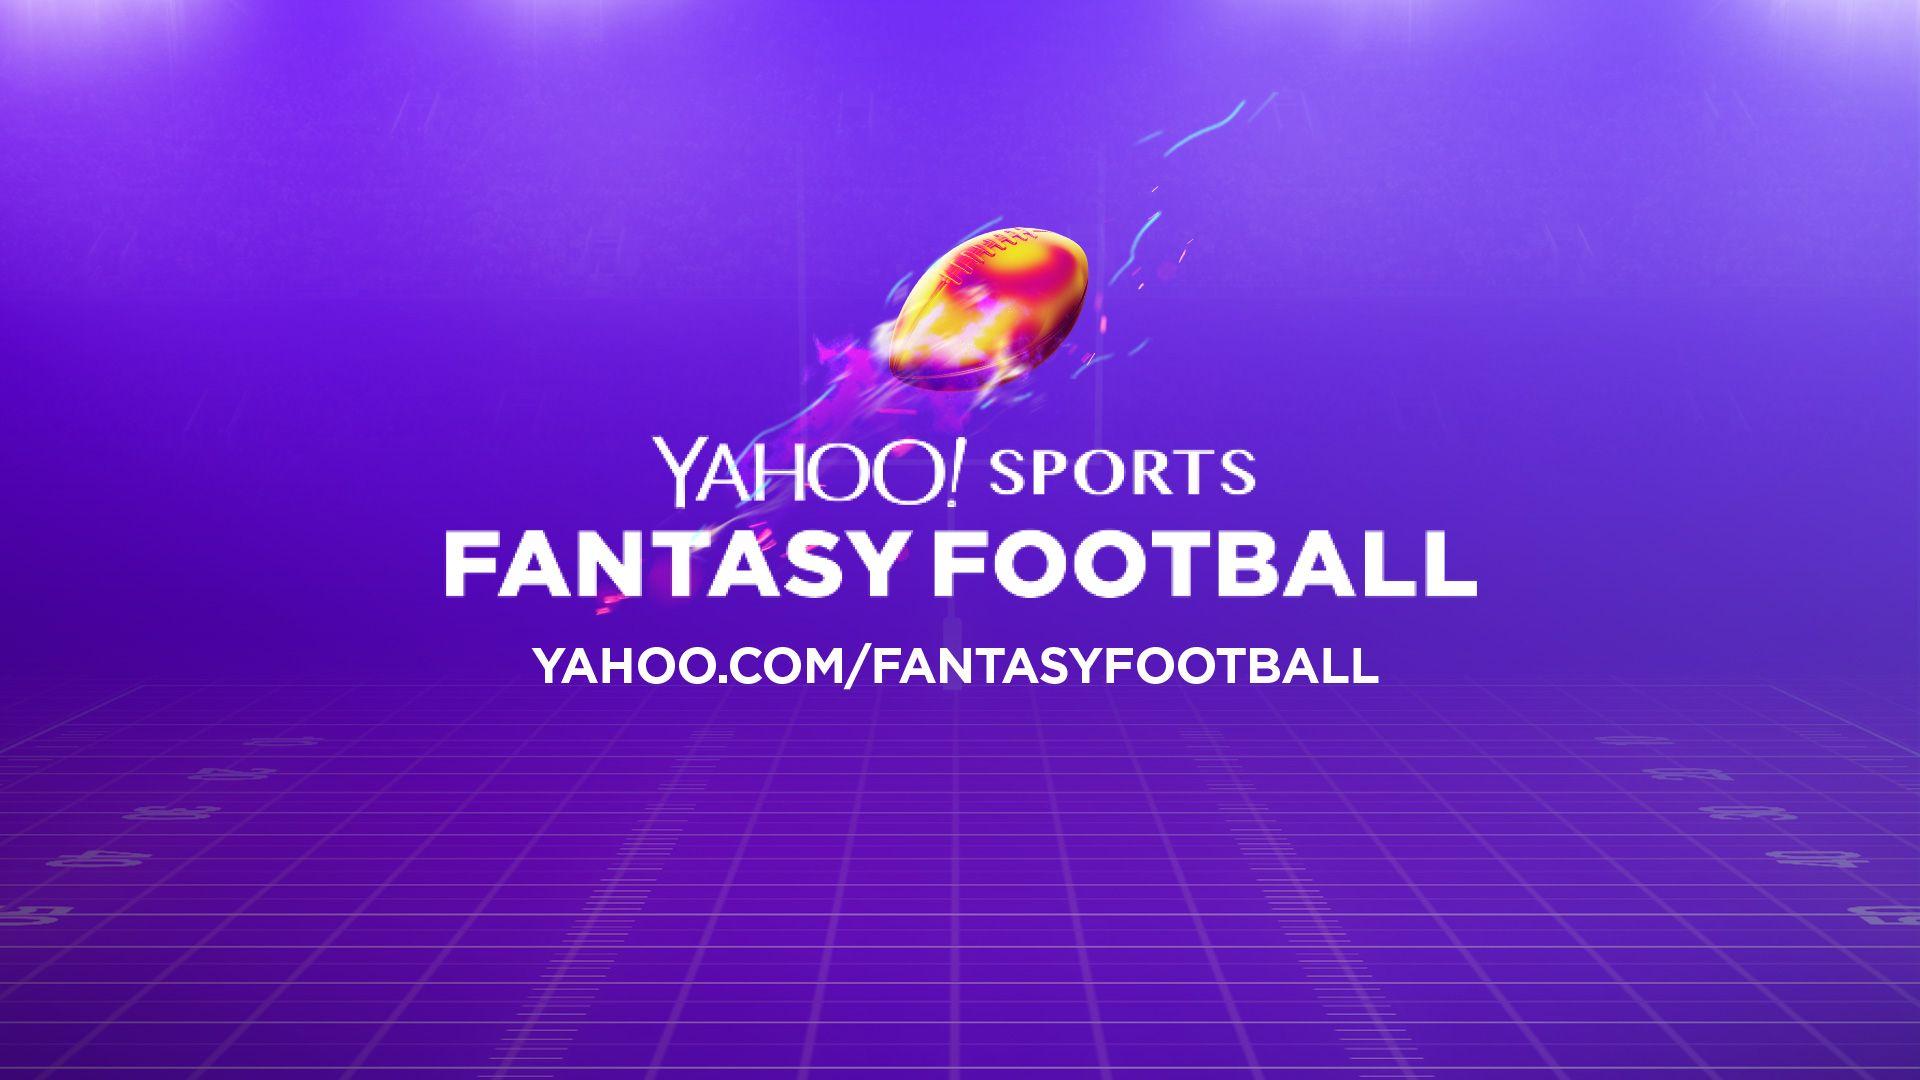 Yahoo Looks To Enter Fantasy Sports